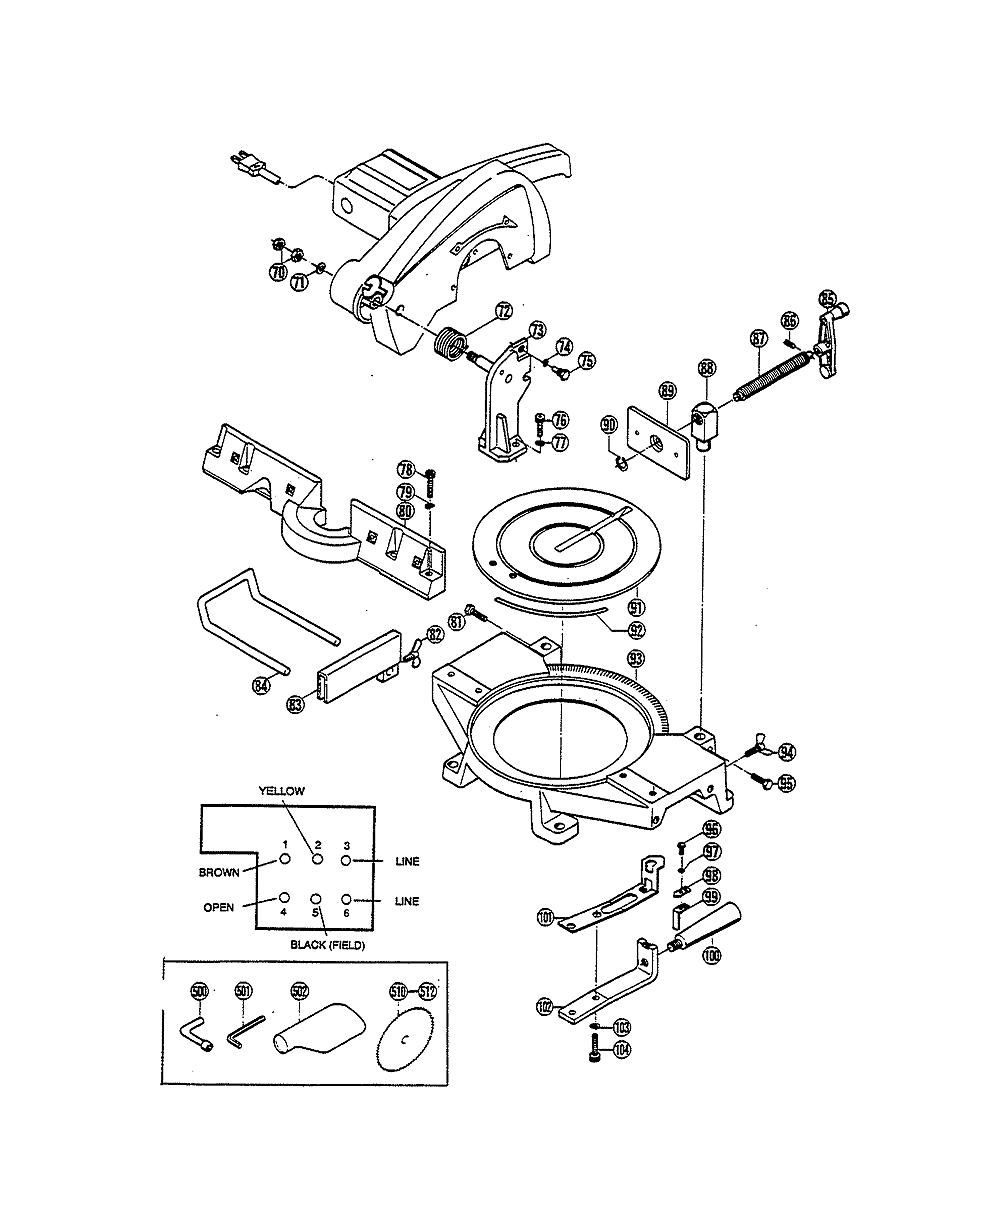 buy ryobi ts251udx replacement tool parts